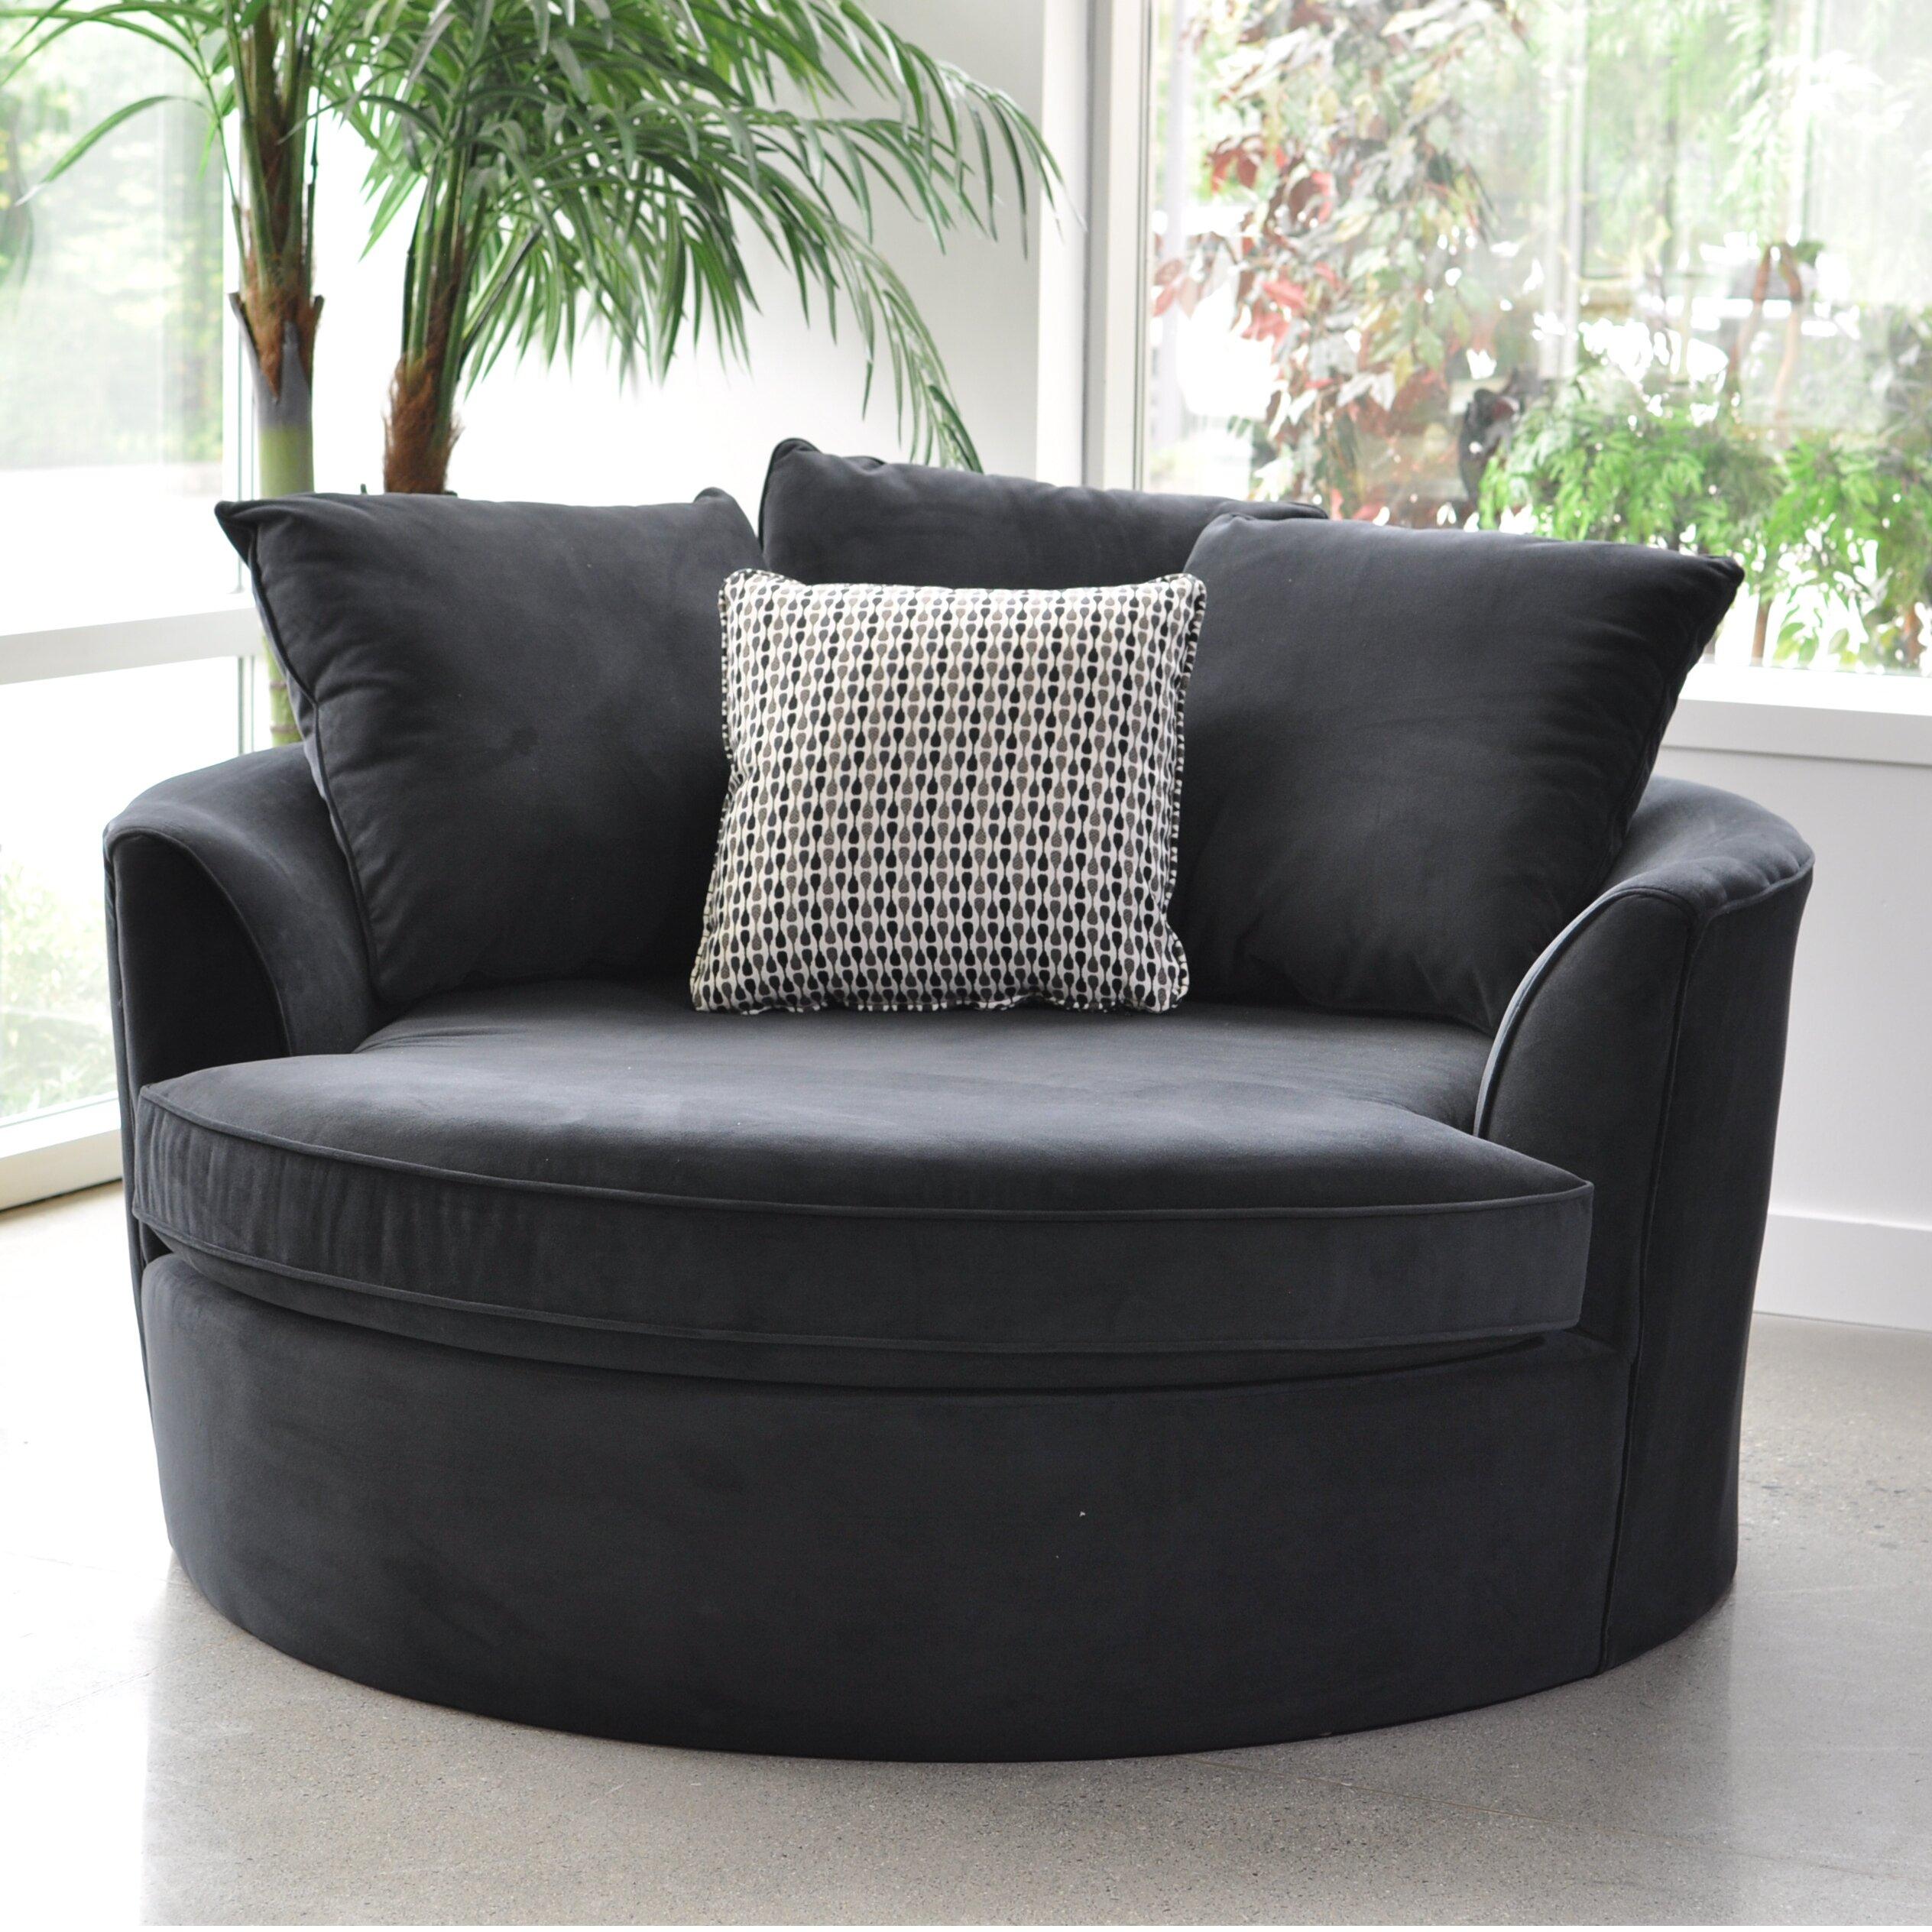 Sofas To Go Cuddler Barrel Chair & Reviews | Wayfair (View 3 of 15)